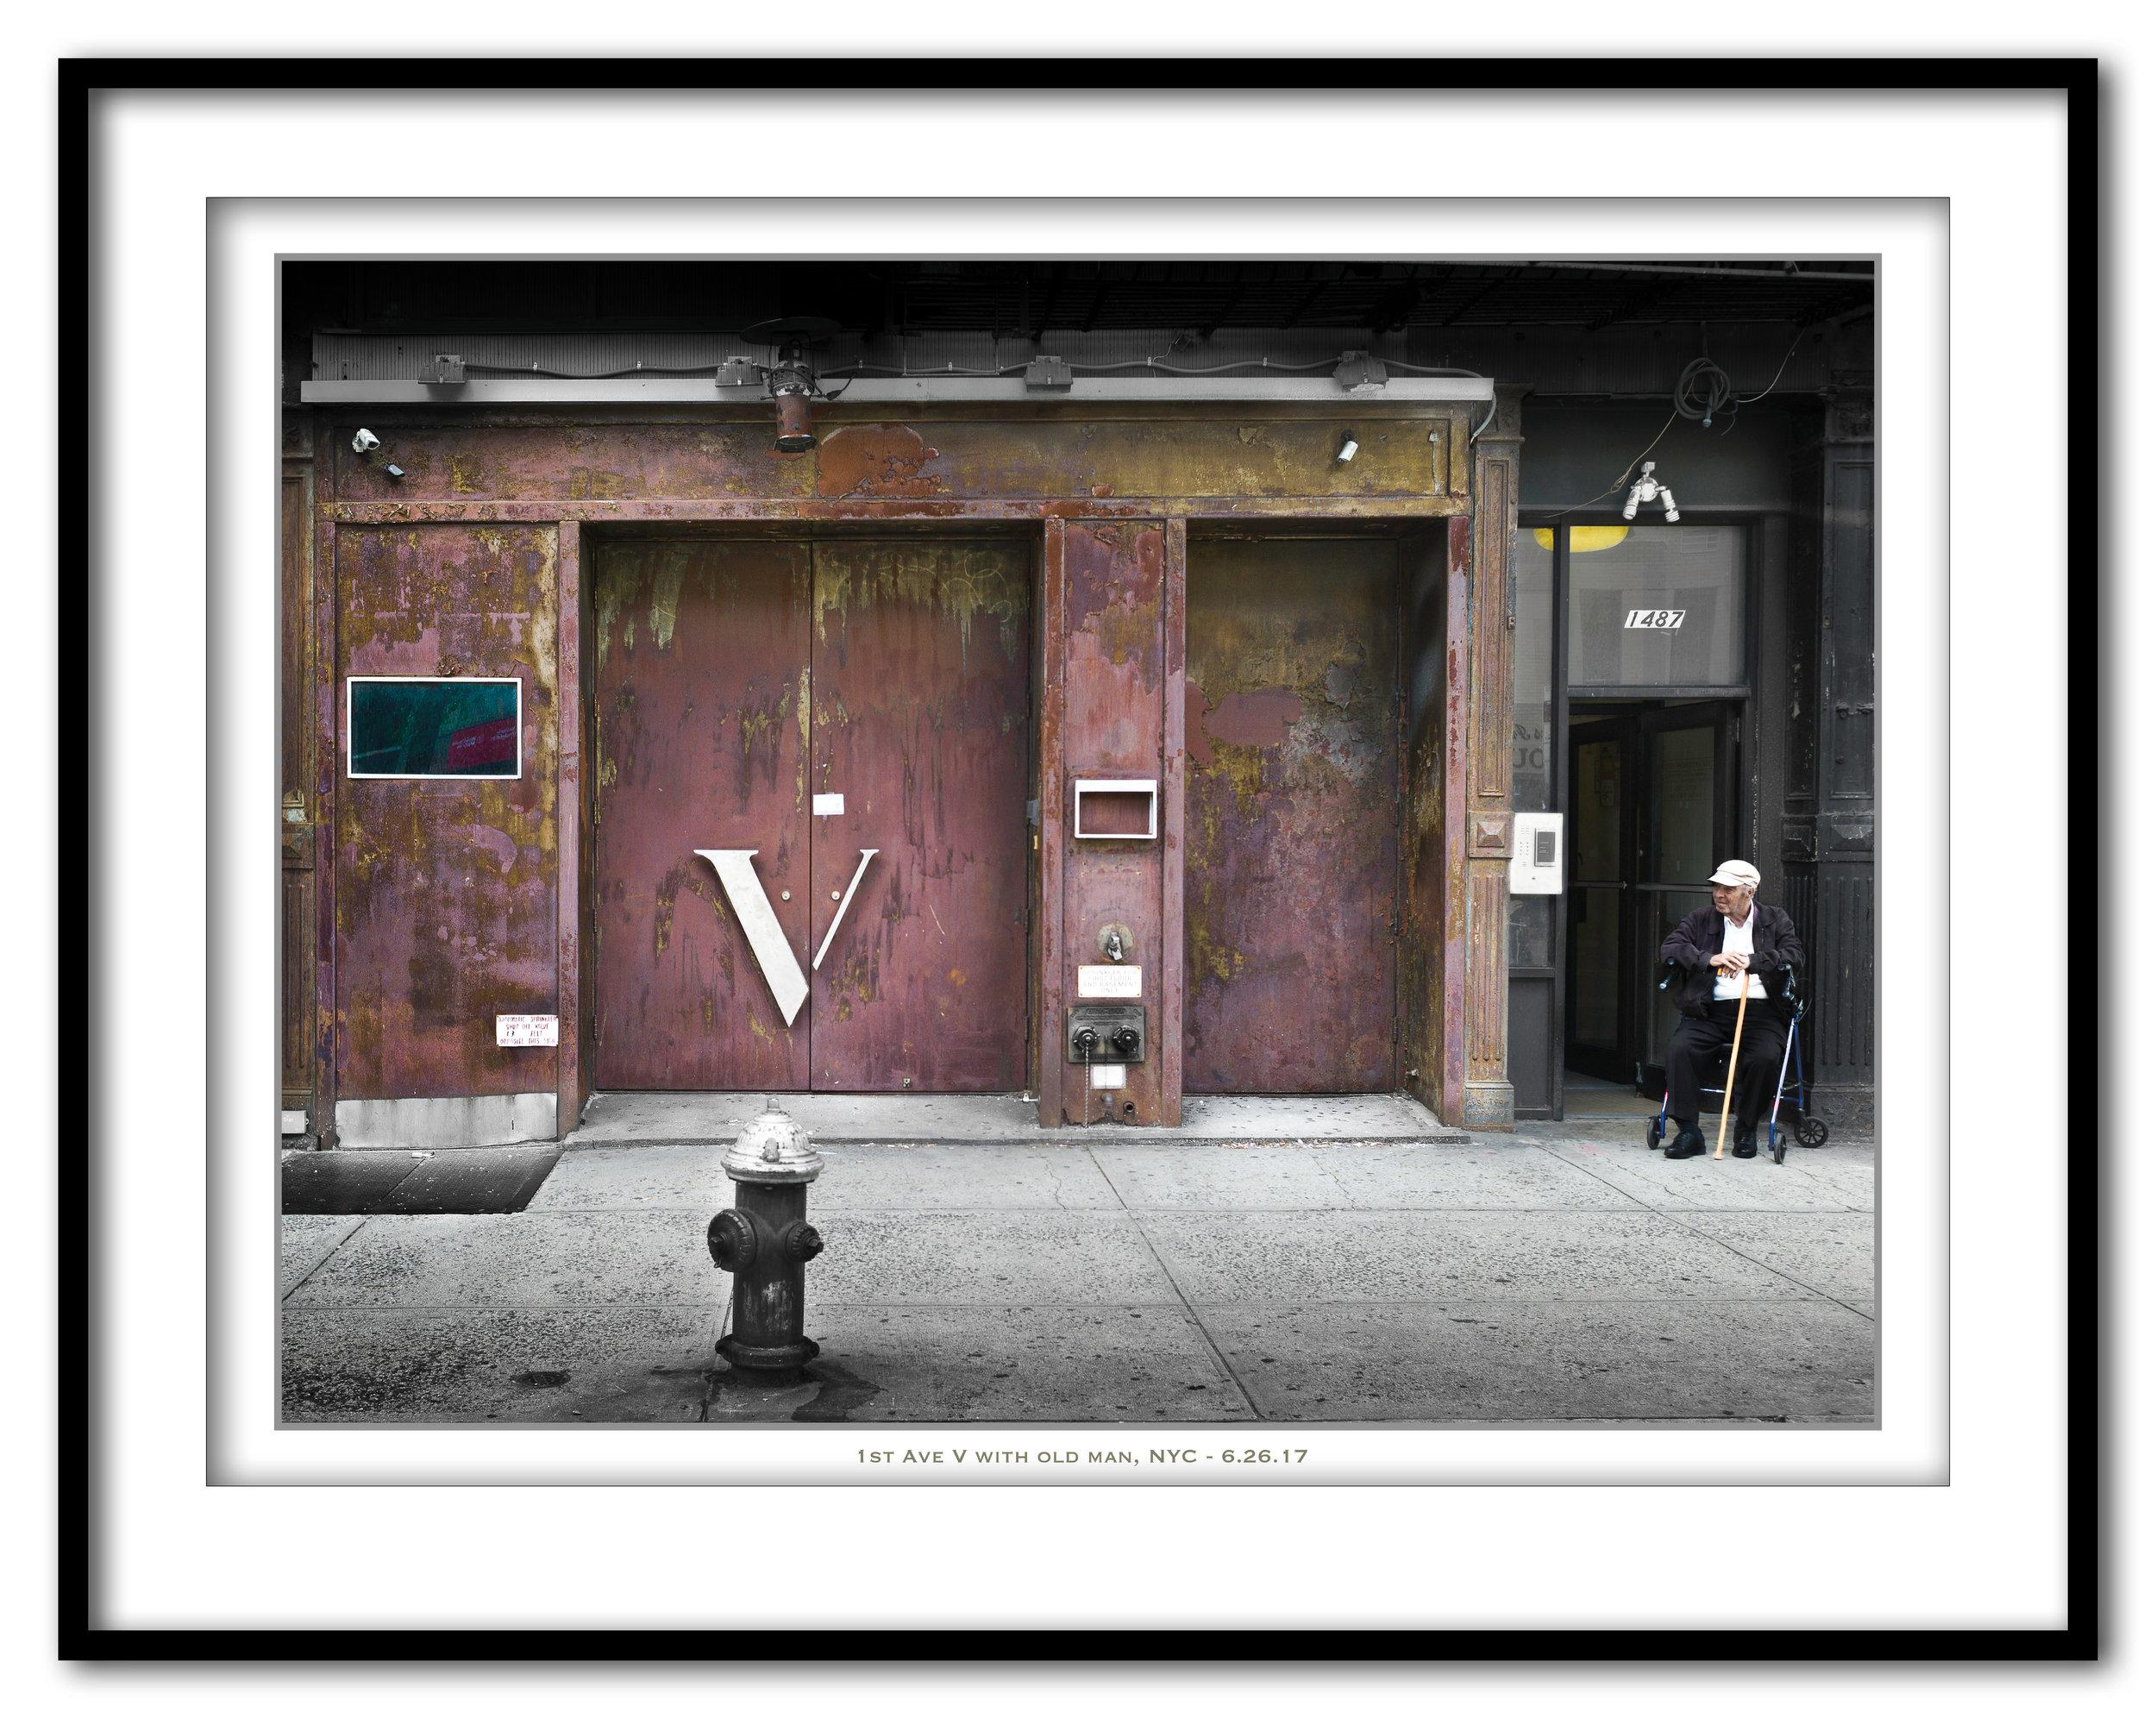 1 St Ave V with old man - 6.26.17- Framed.jpg